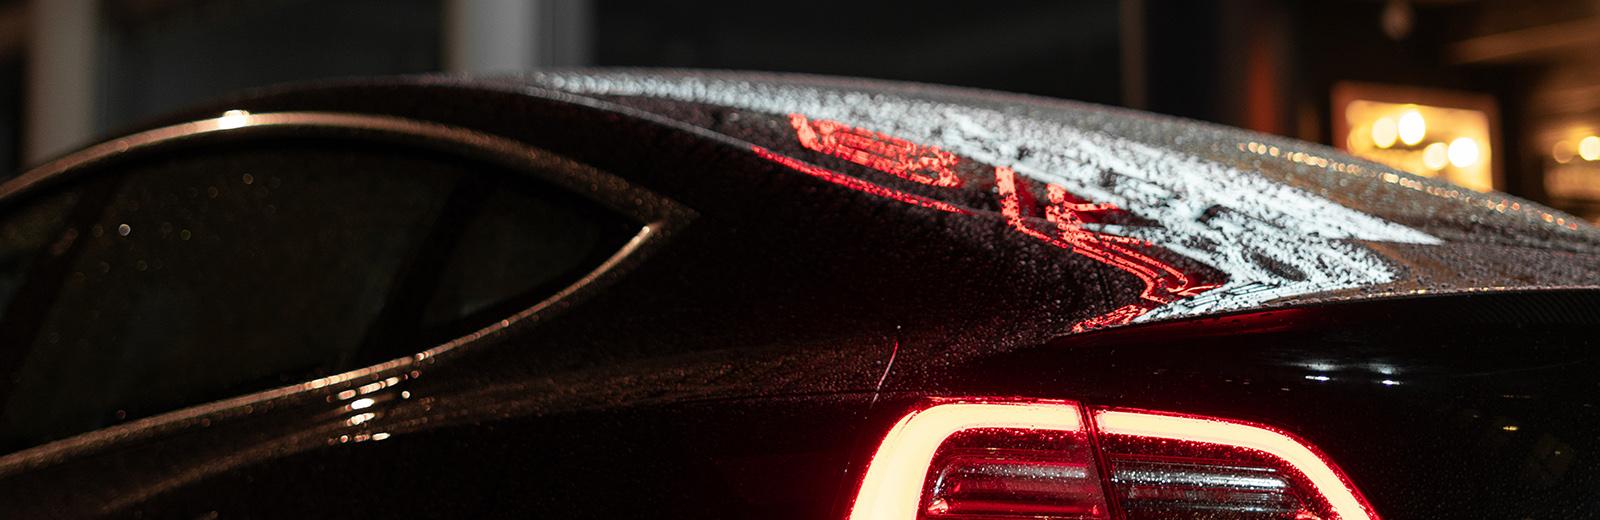 EV charging in rain safe